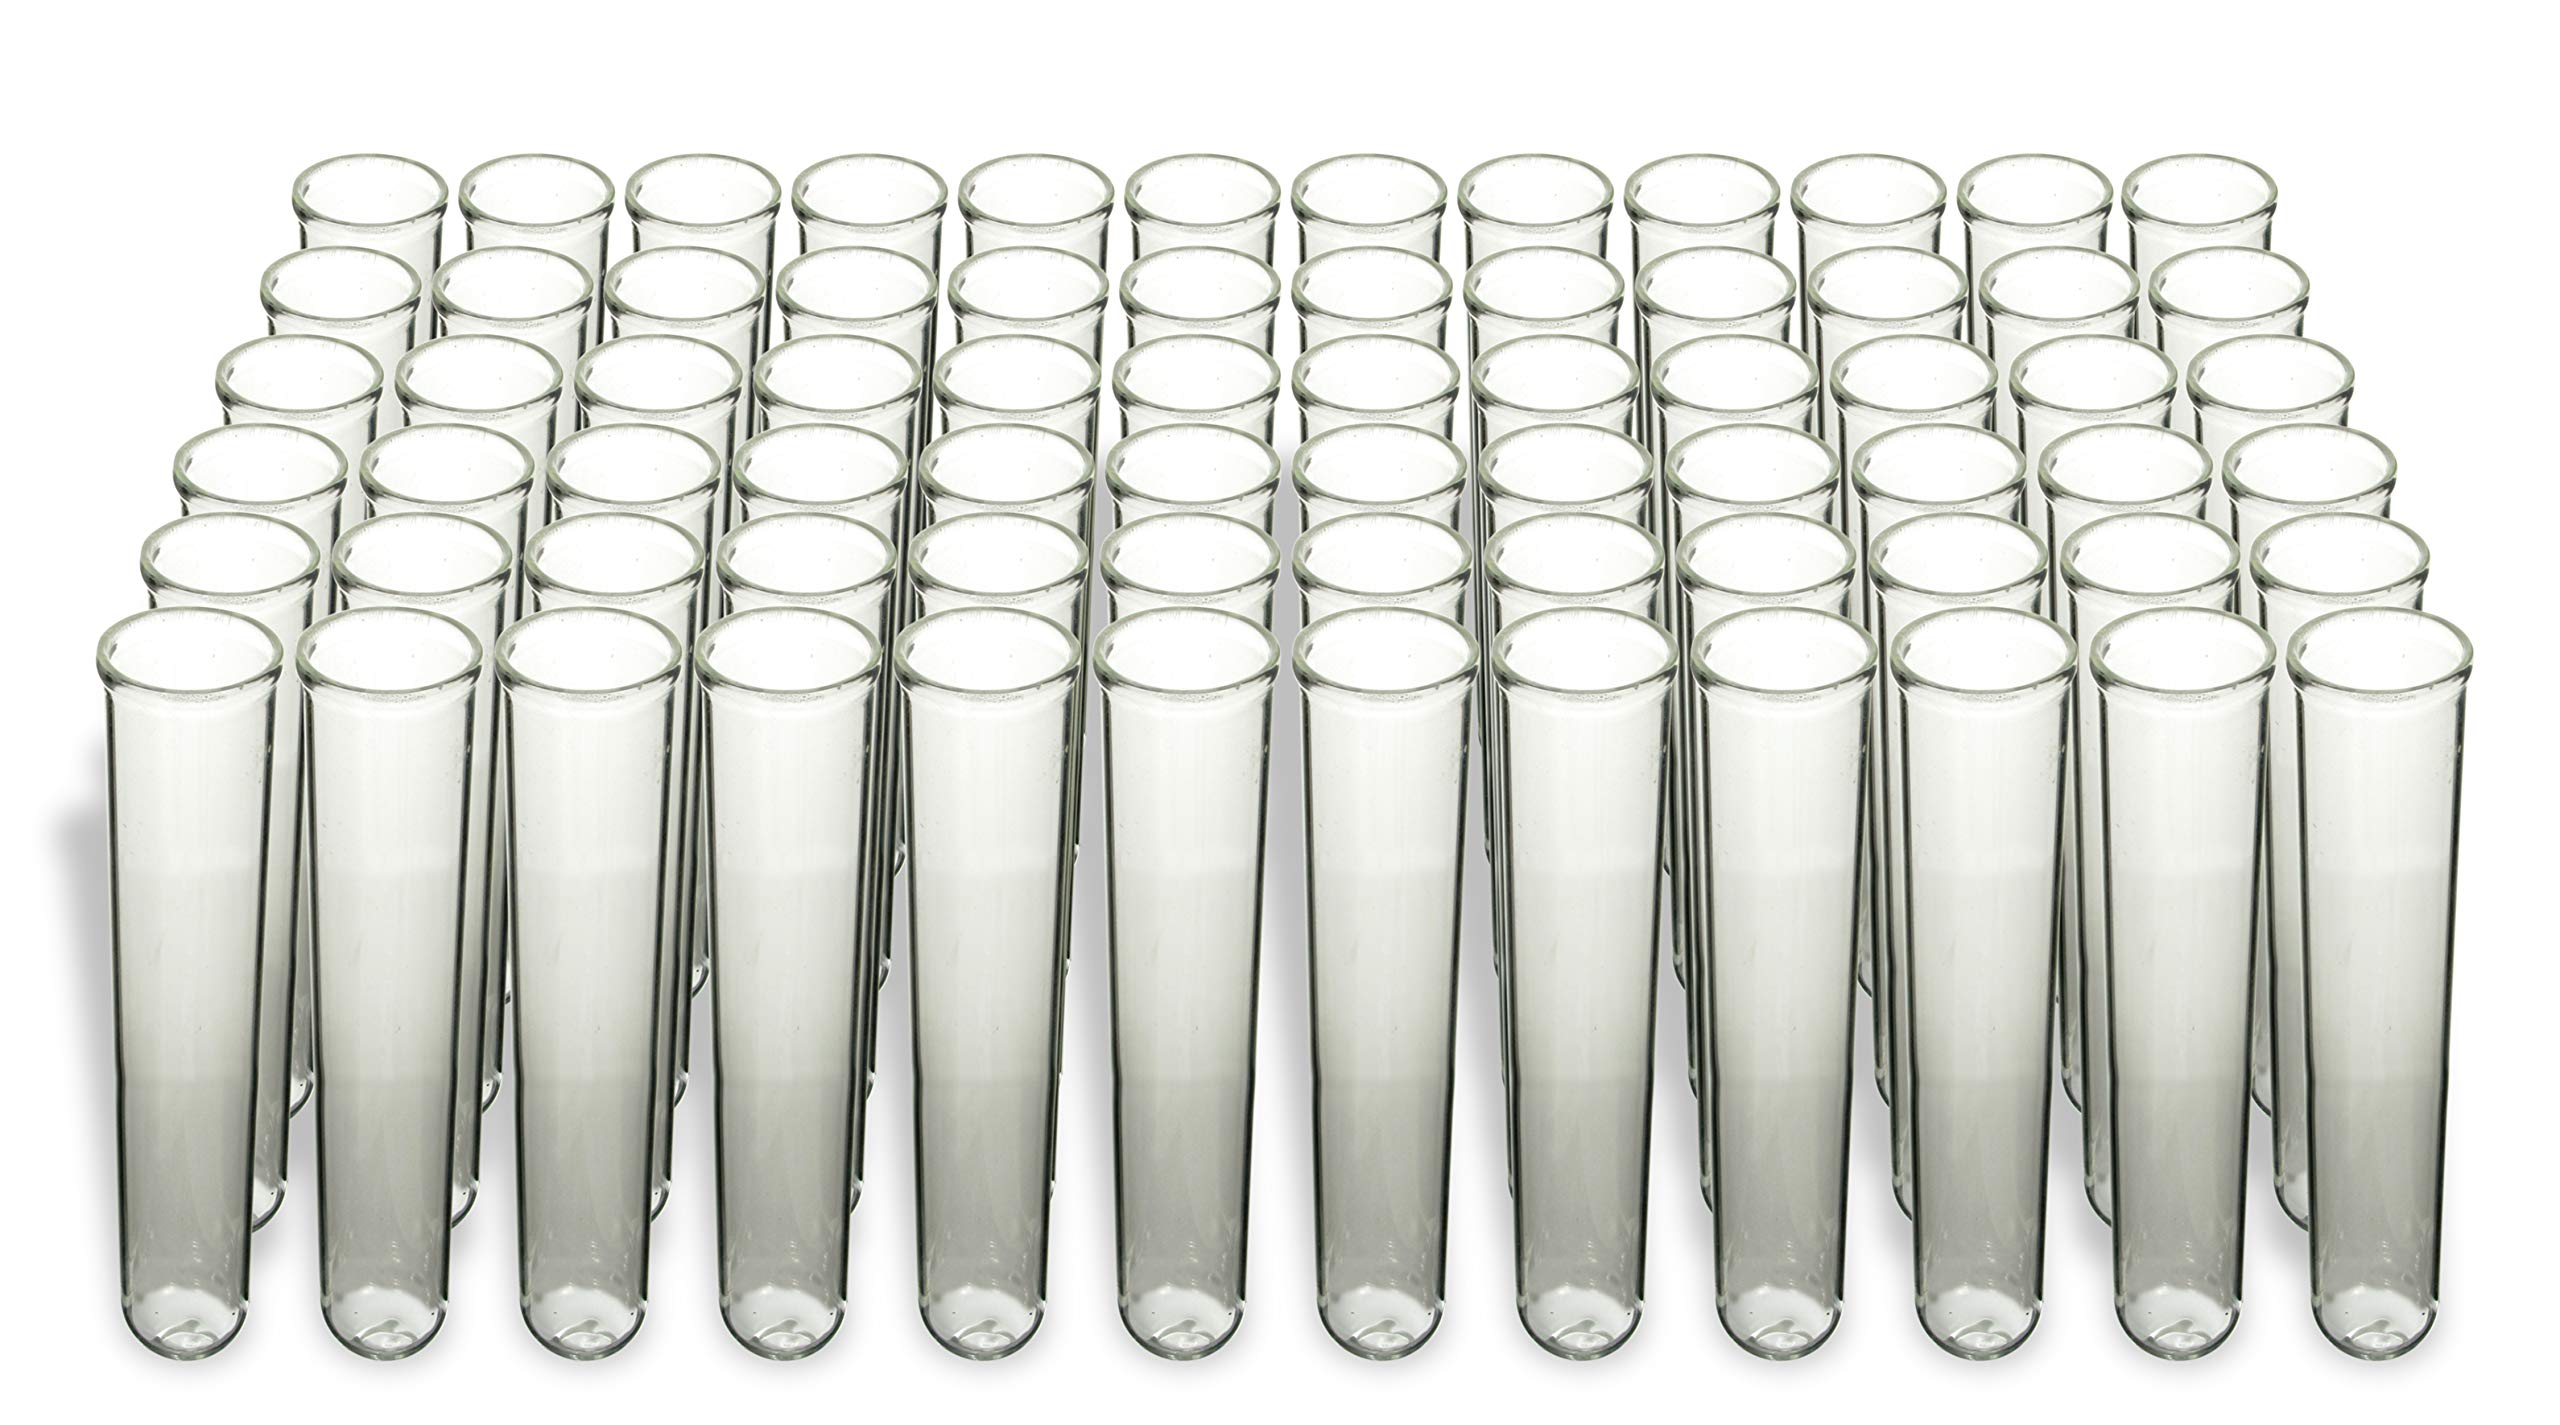 American Educational Borosilicate Glass Round Bottom Test Tube, 25mm OD x 150mm Length (Pack of 72)